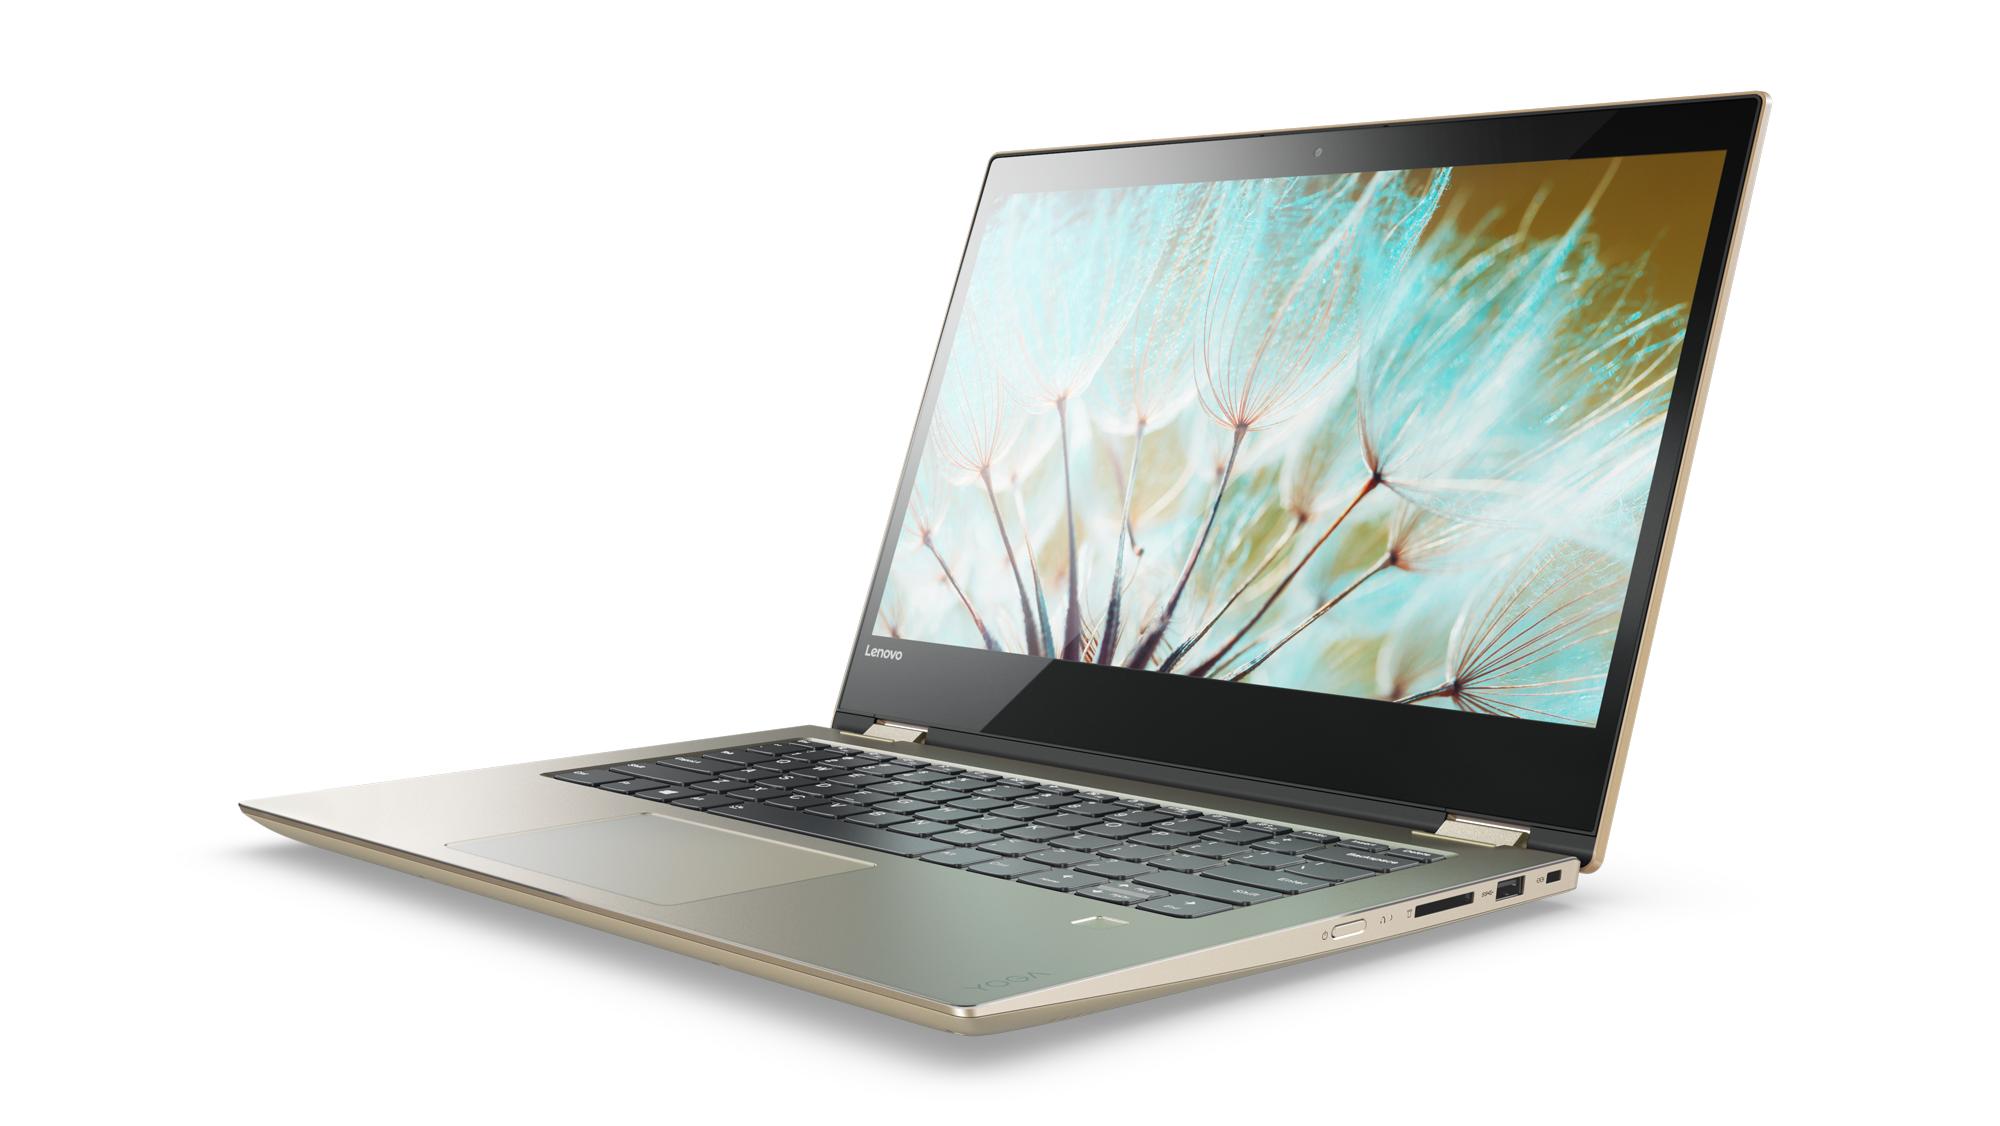 "Lenovo YOGA 520-14IKB Pentium-DC 2,30GHz/4GB/SSD 256GB/14"" FHD/IPS/AG/multitouch/FPR/WIN10 zlatá 80X8005ECK"